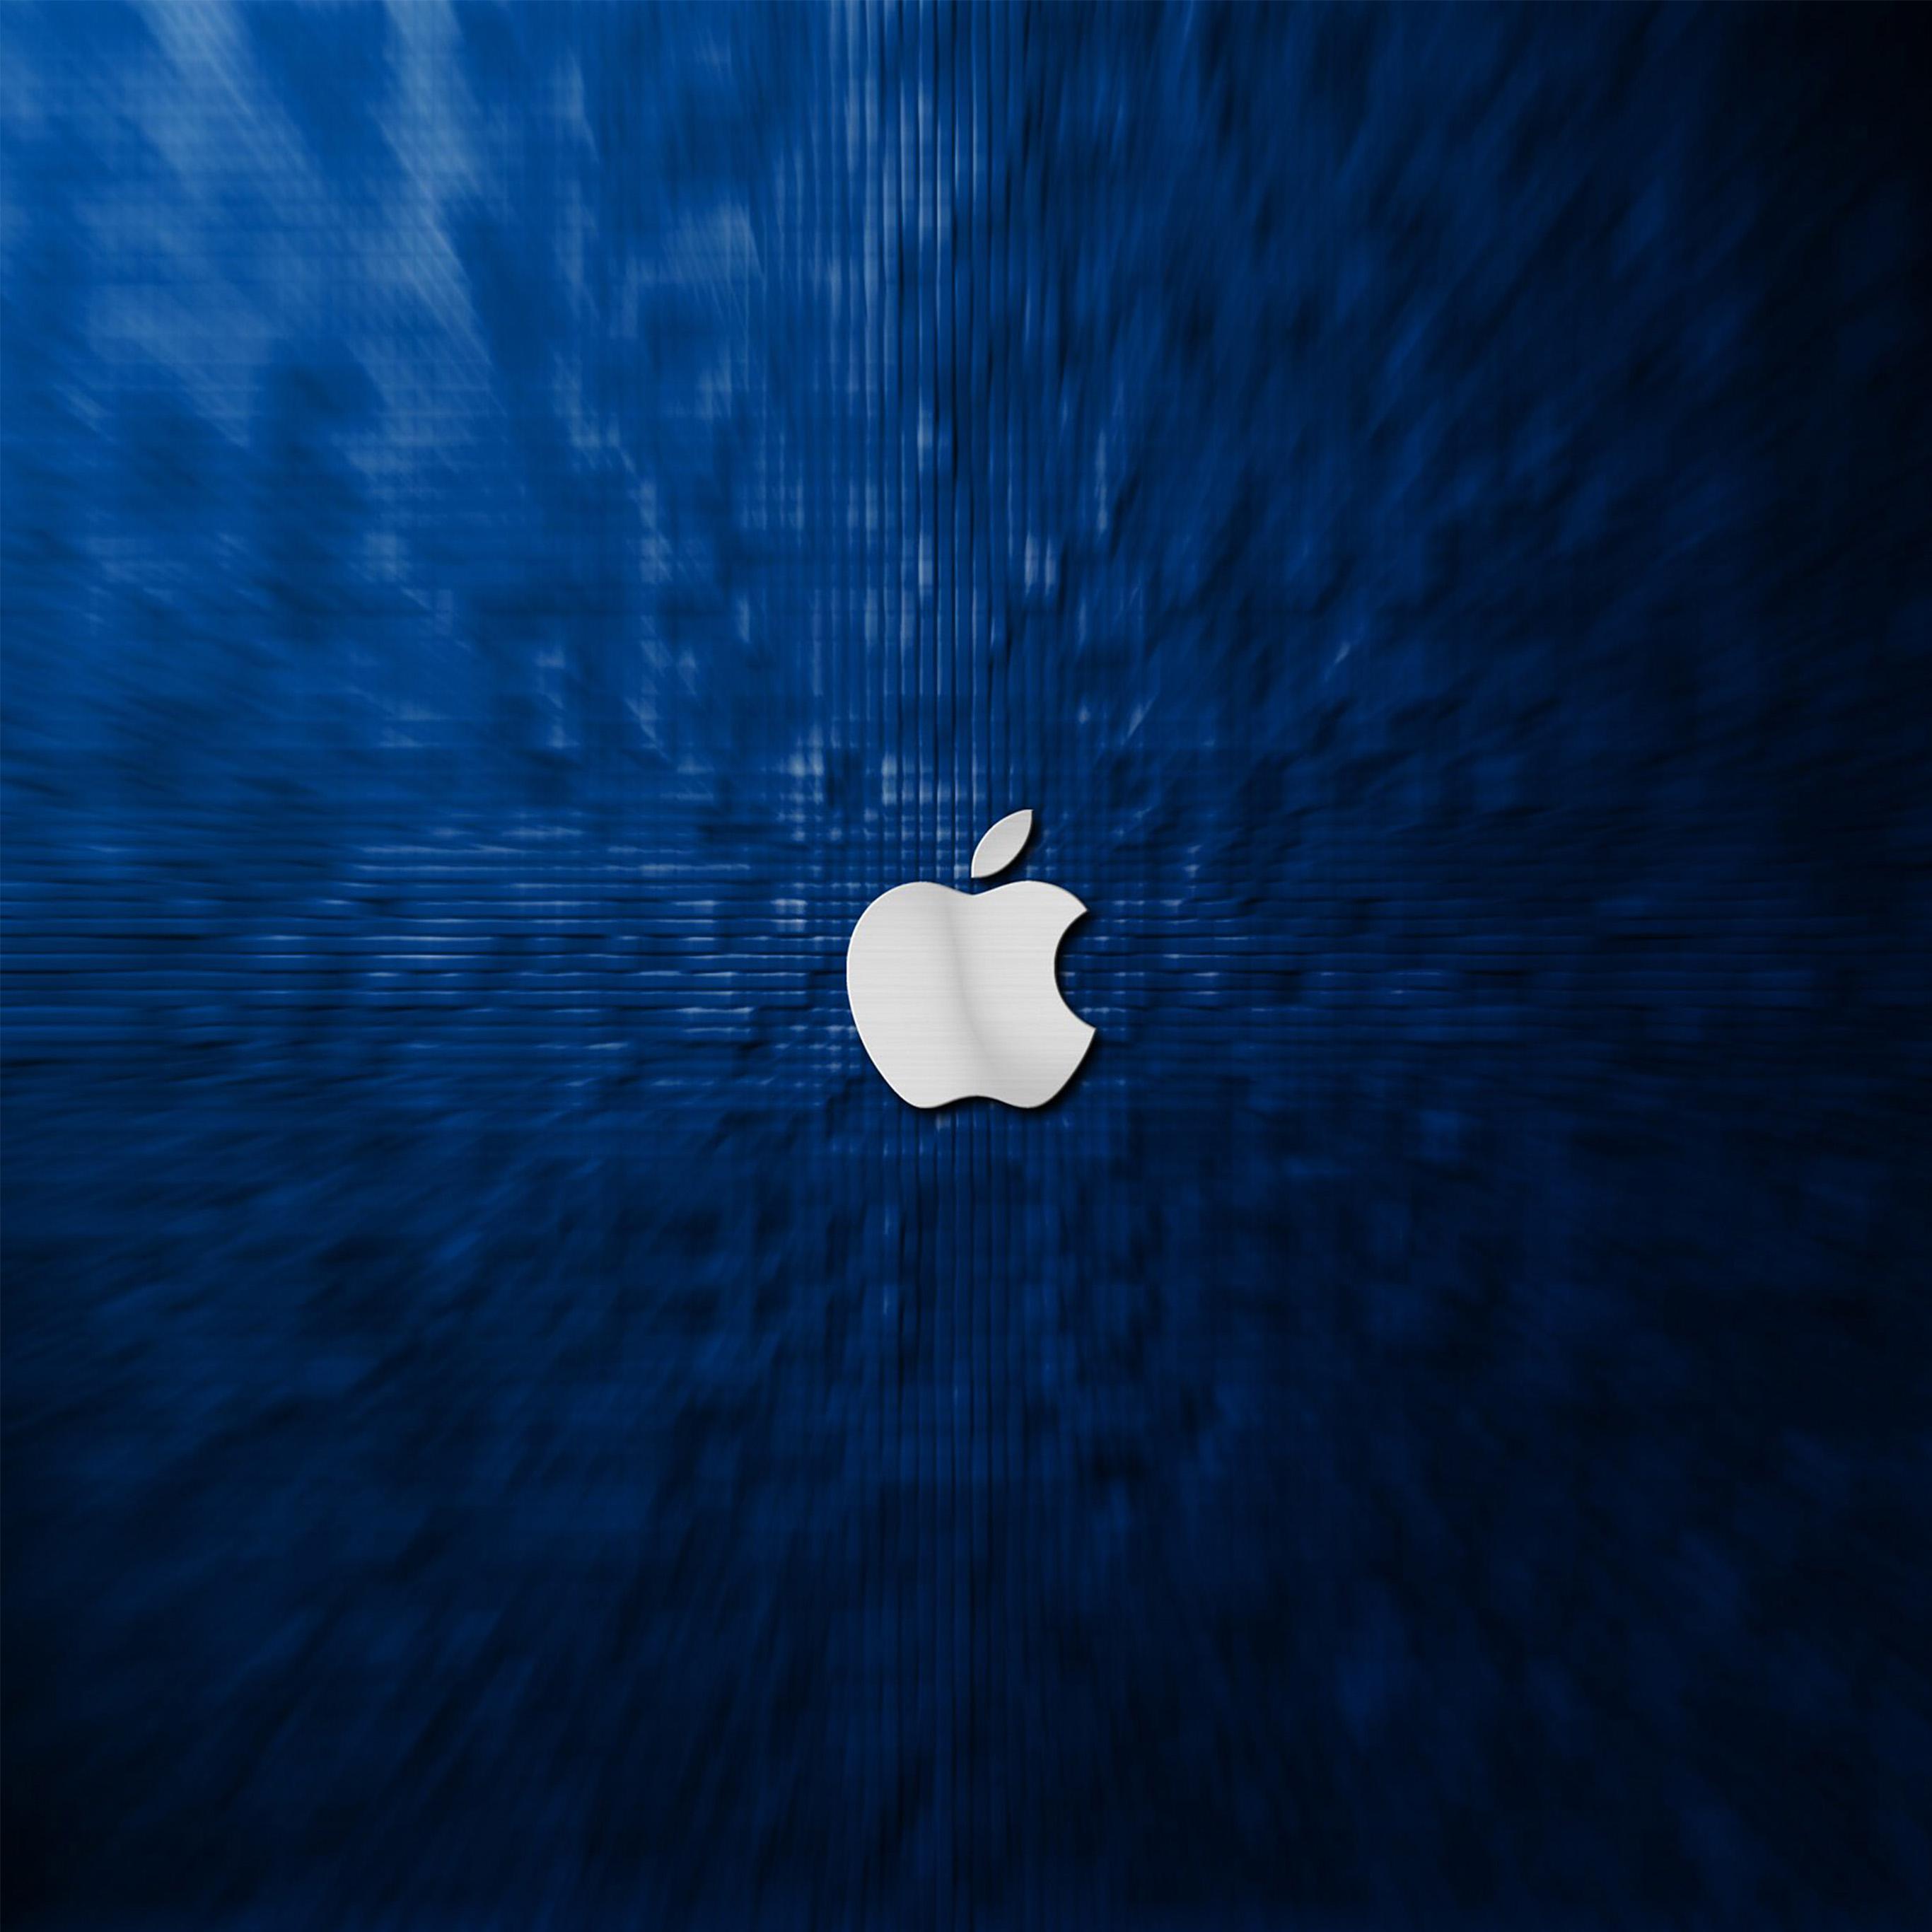 freeios7com apple wallpaper apple matrix ipad retina parallaxjpg 2732x2732